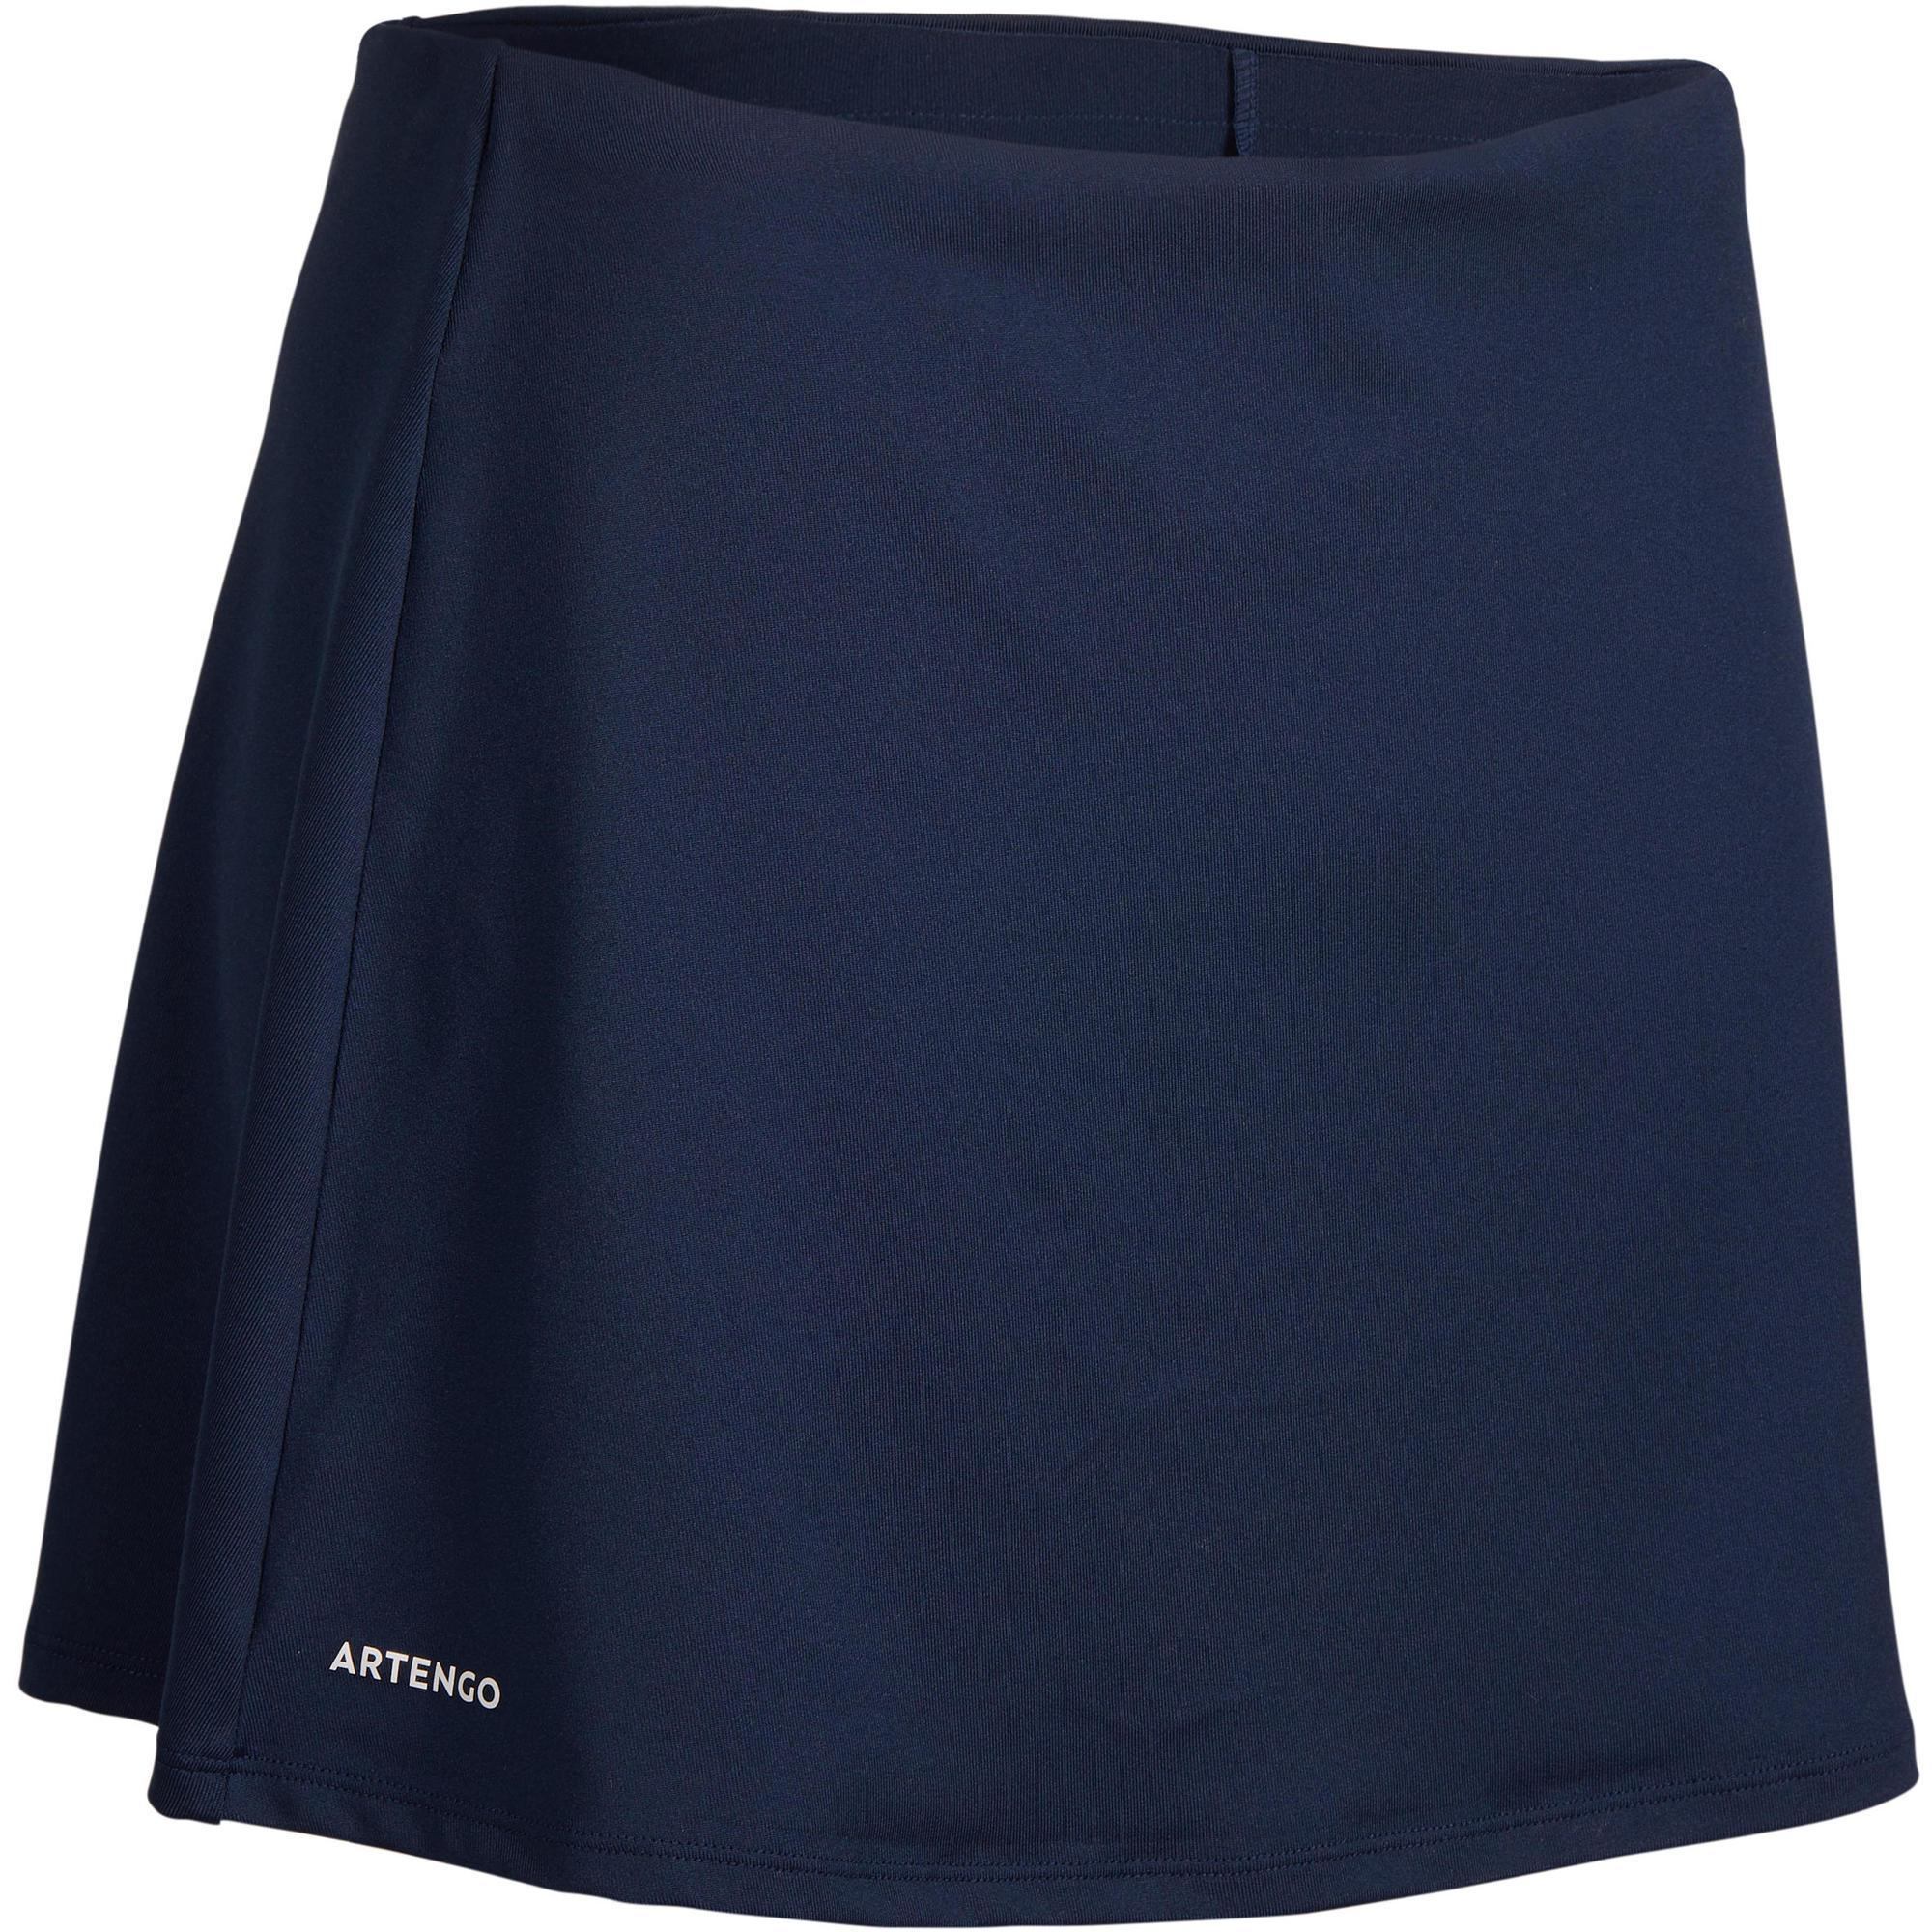 Tennisrock Essential 100 Damen marineblau | Sportbekleidung > Sportröcke | Blau | Artengo